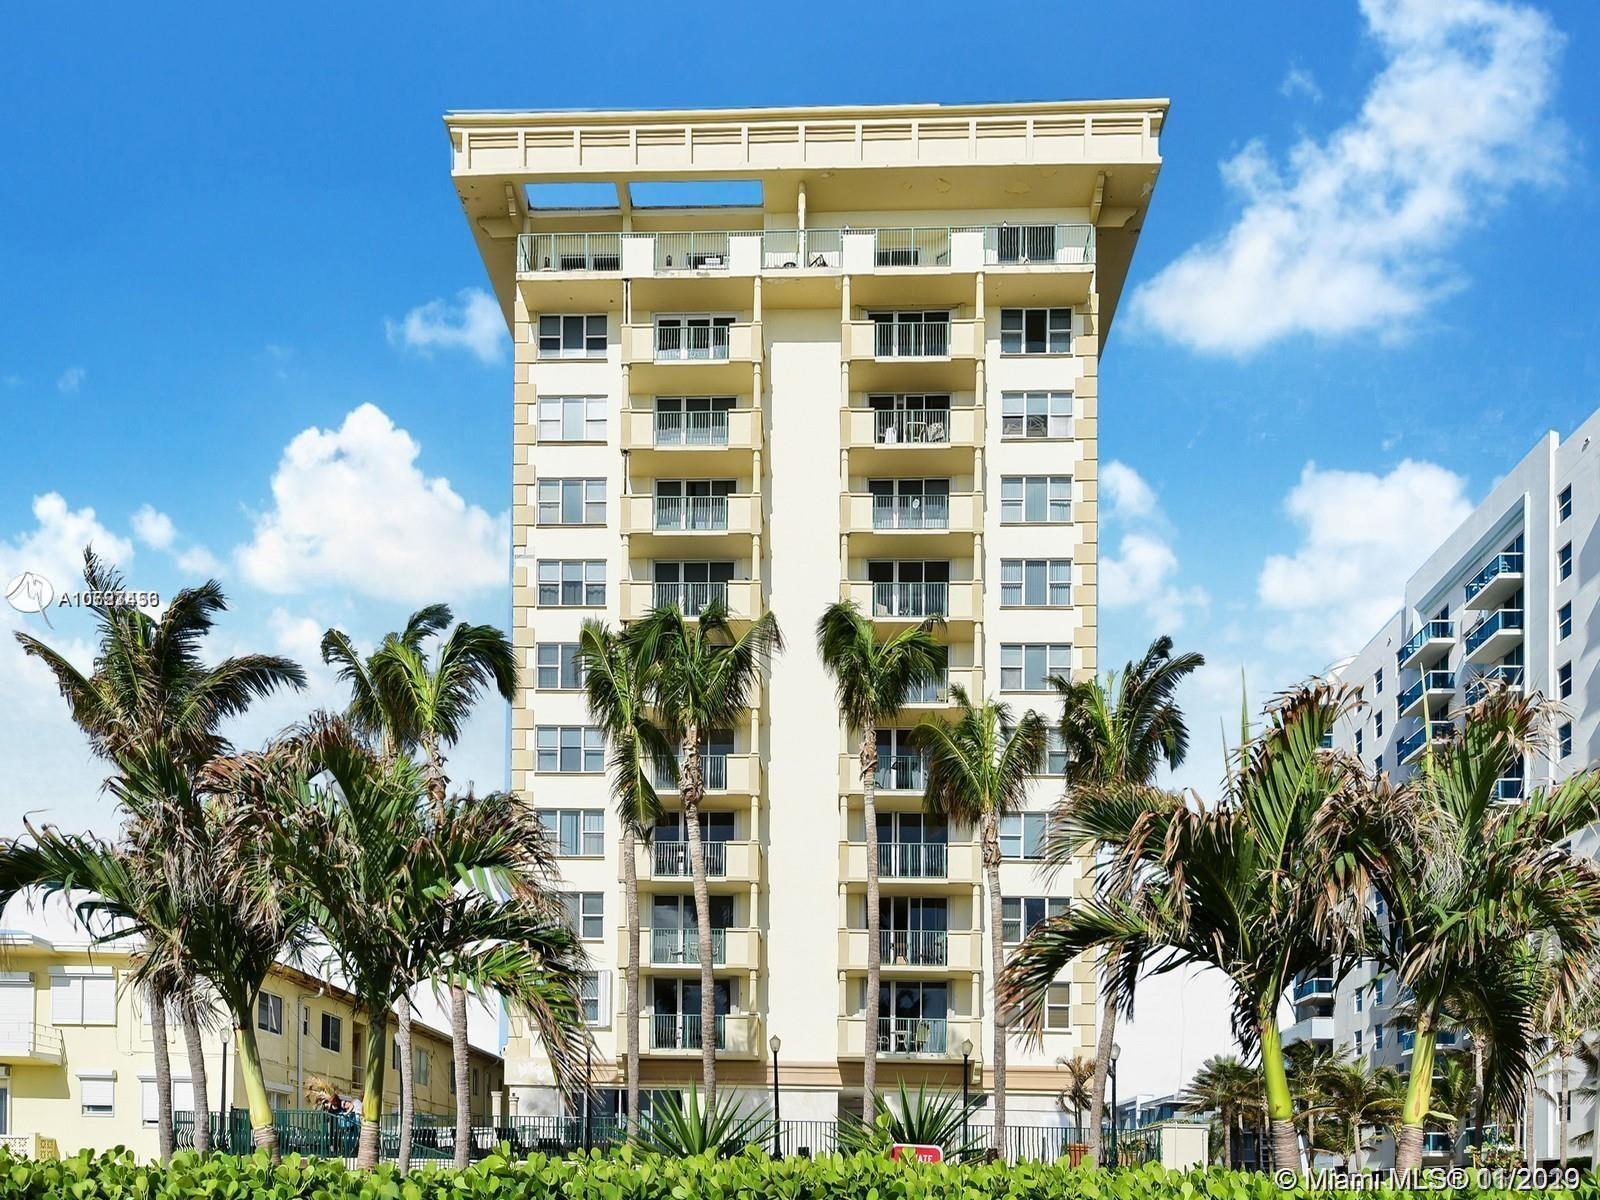 Carlisle on the Ocean #304 - 9195 Collins Avenue #304, Sunny Isles Beach, FL 3315